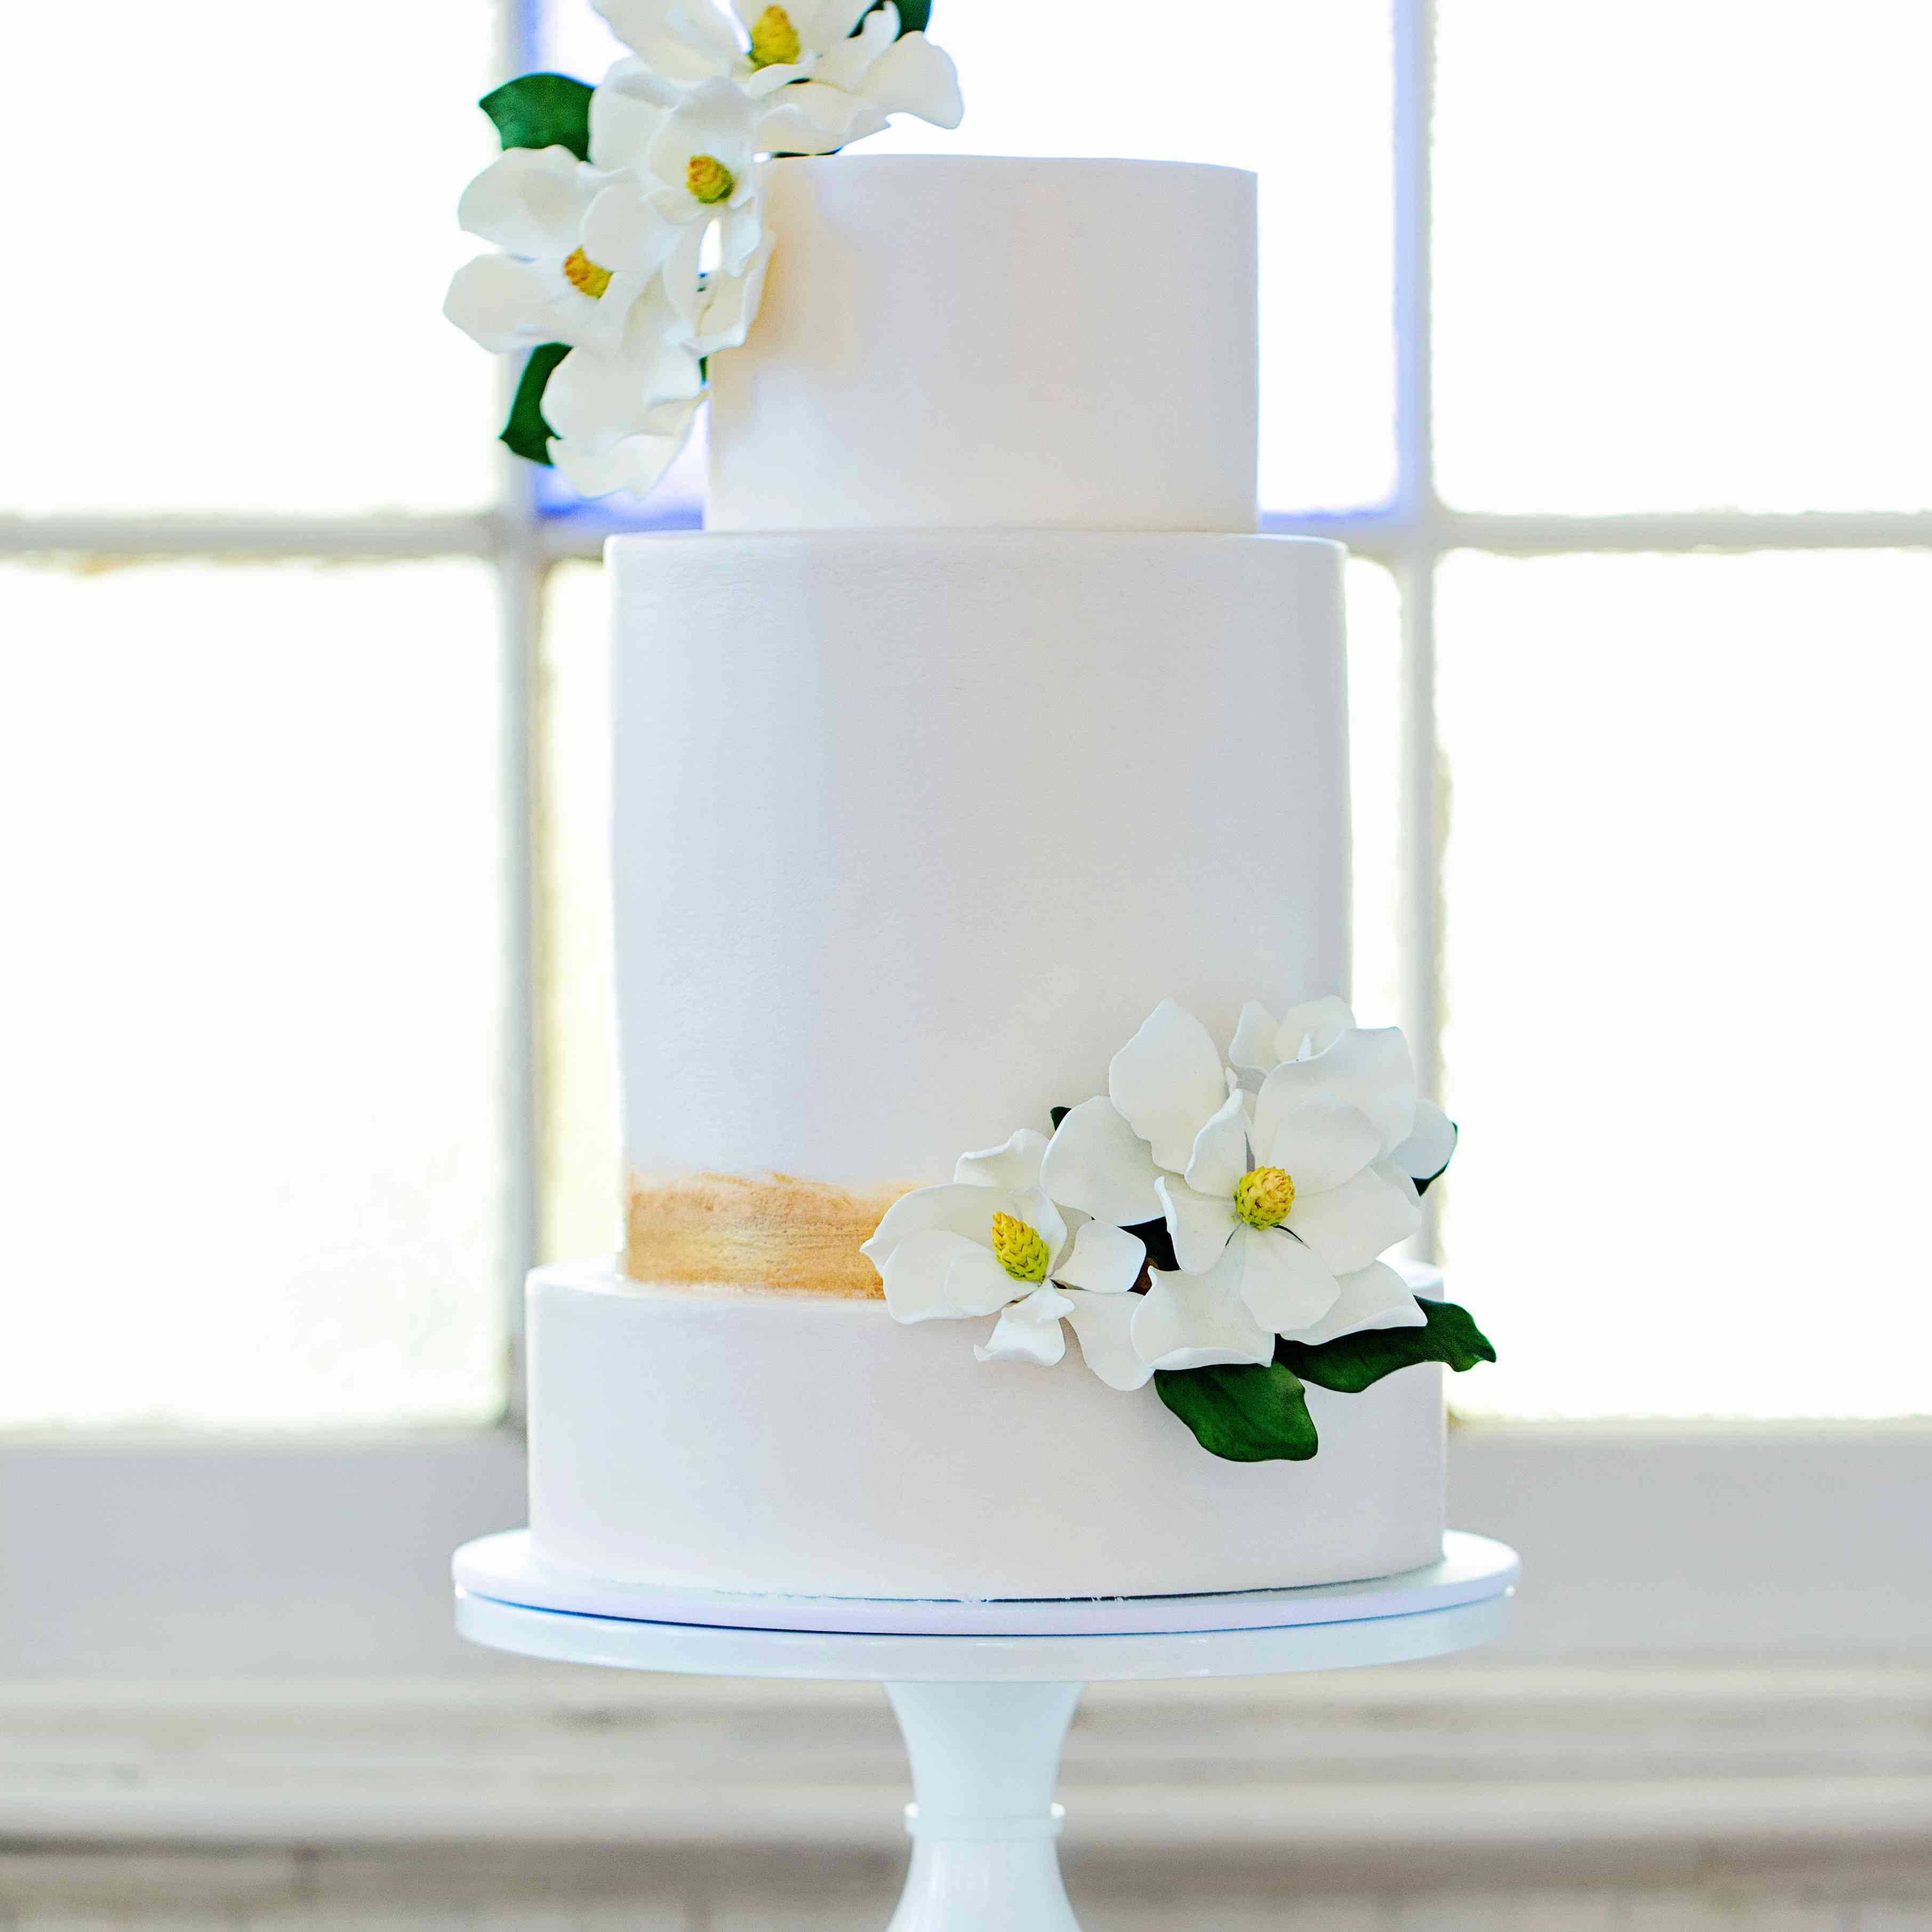 Three-Tiered White Wedding Cake with Flowers